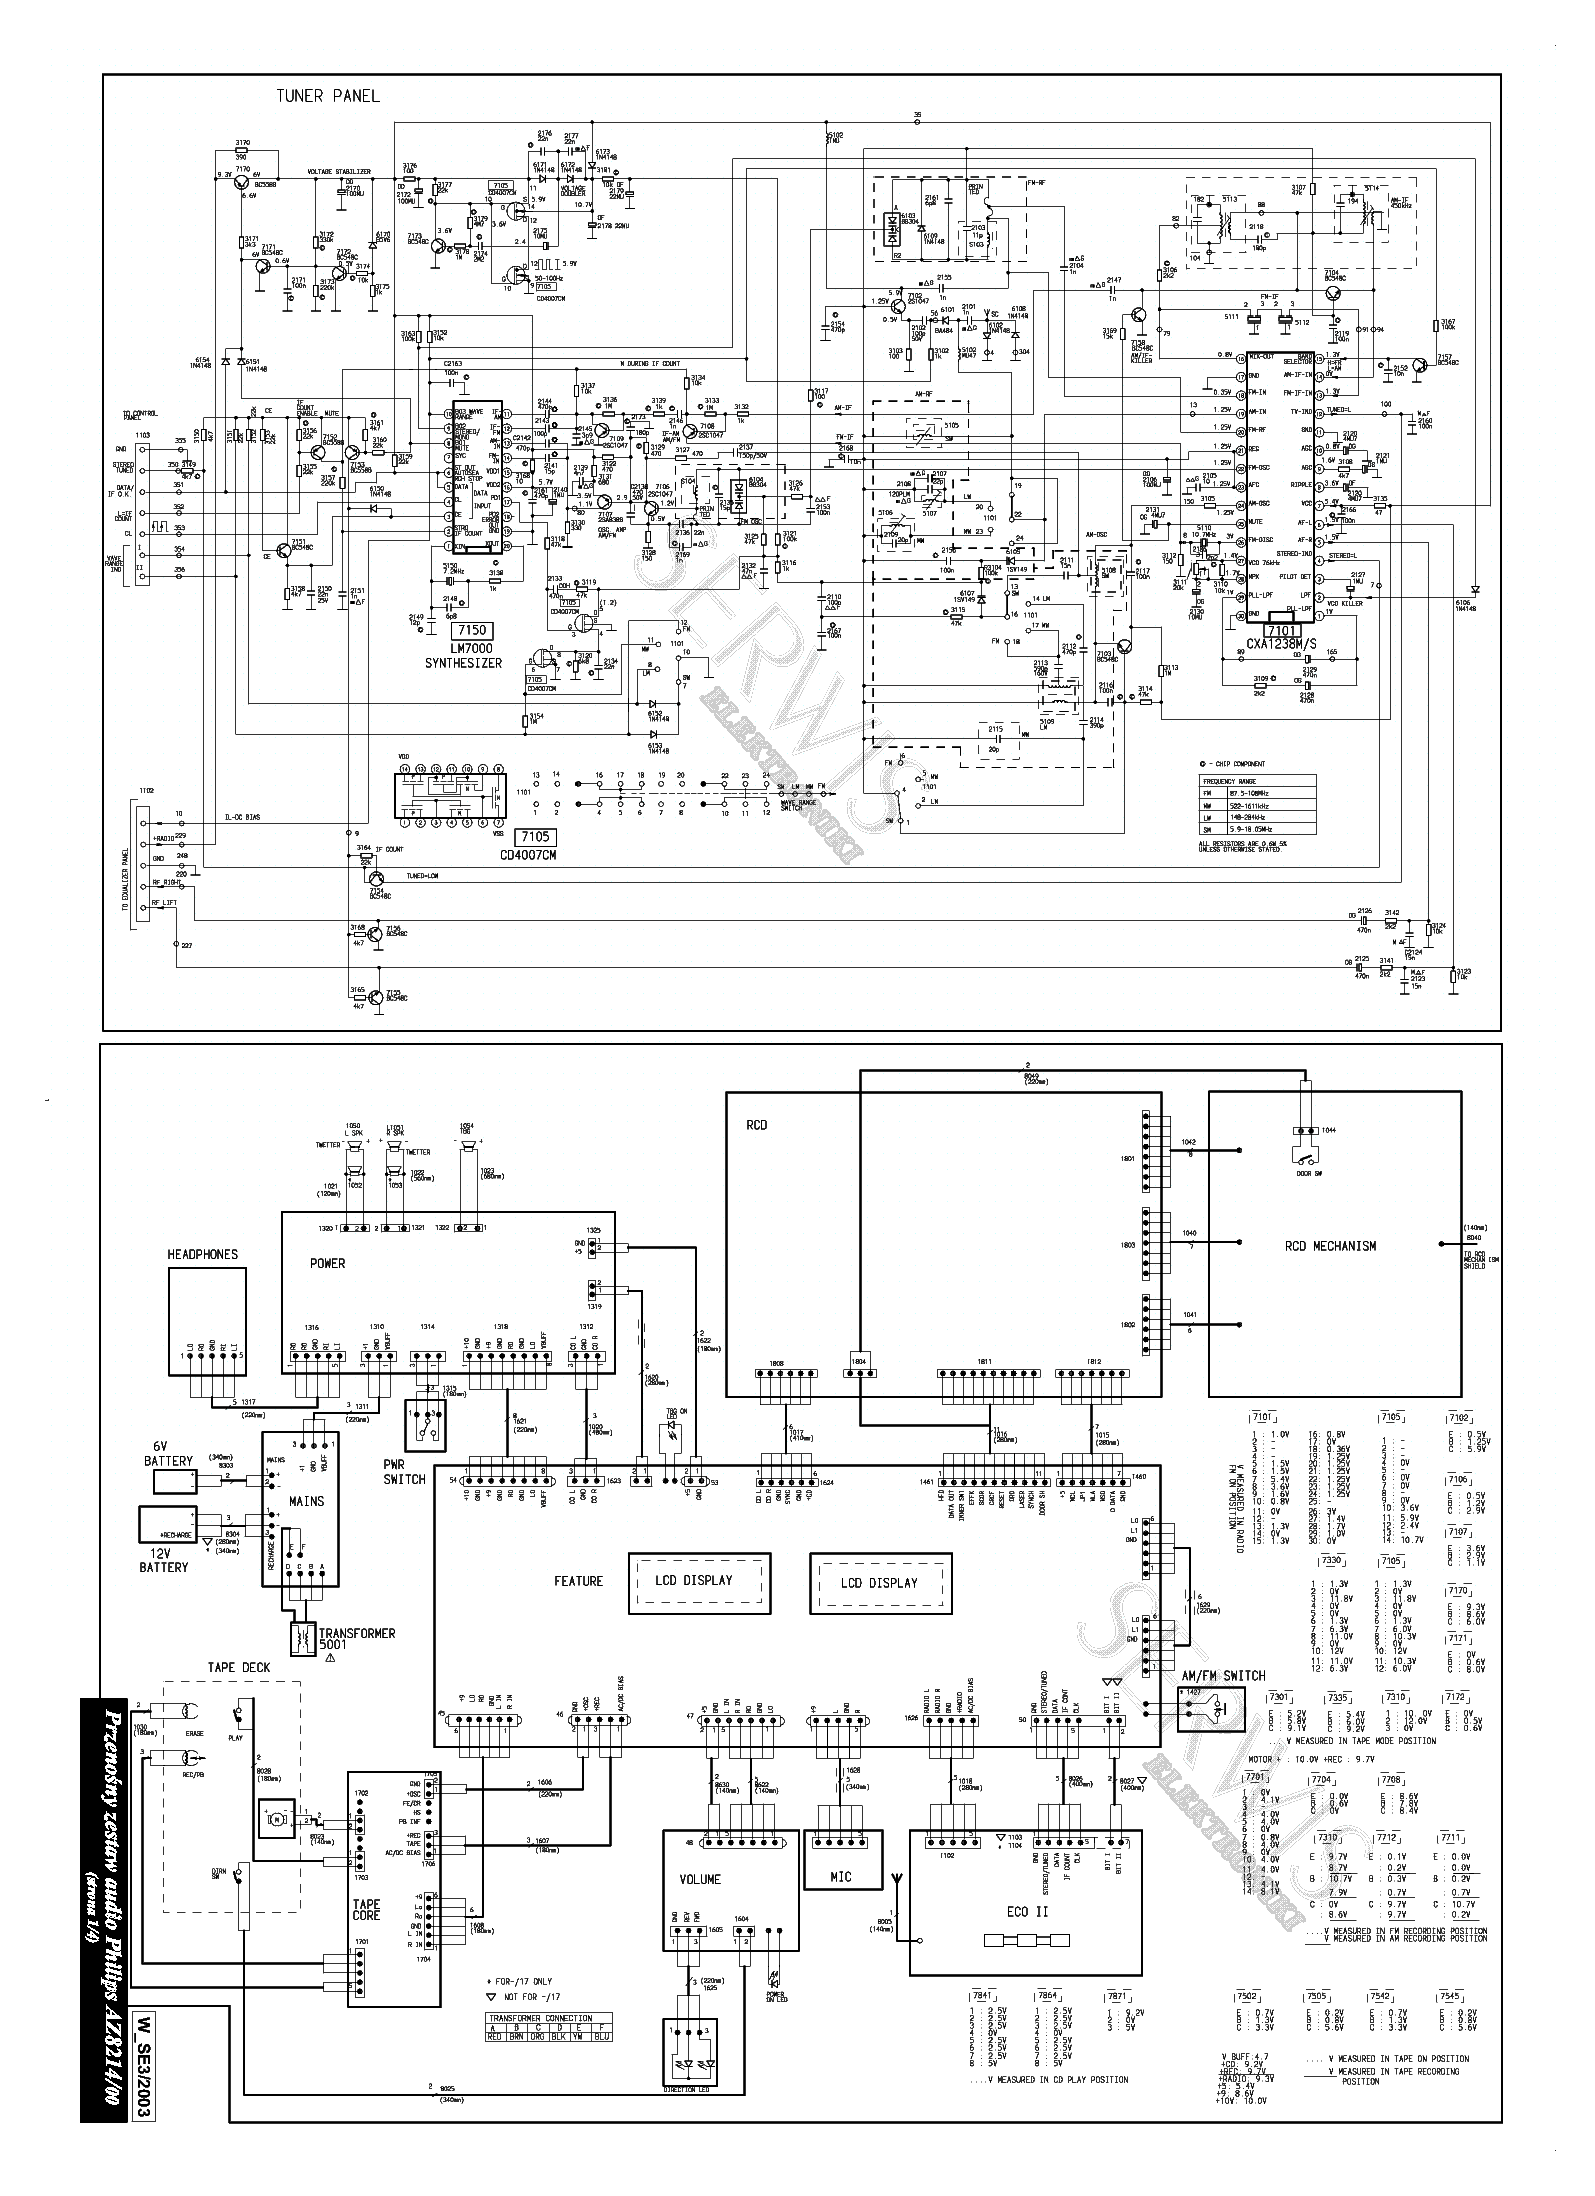 Philips Az8214 Service Manual Download  Schematics  Eeprom